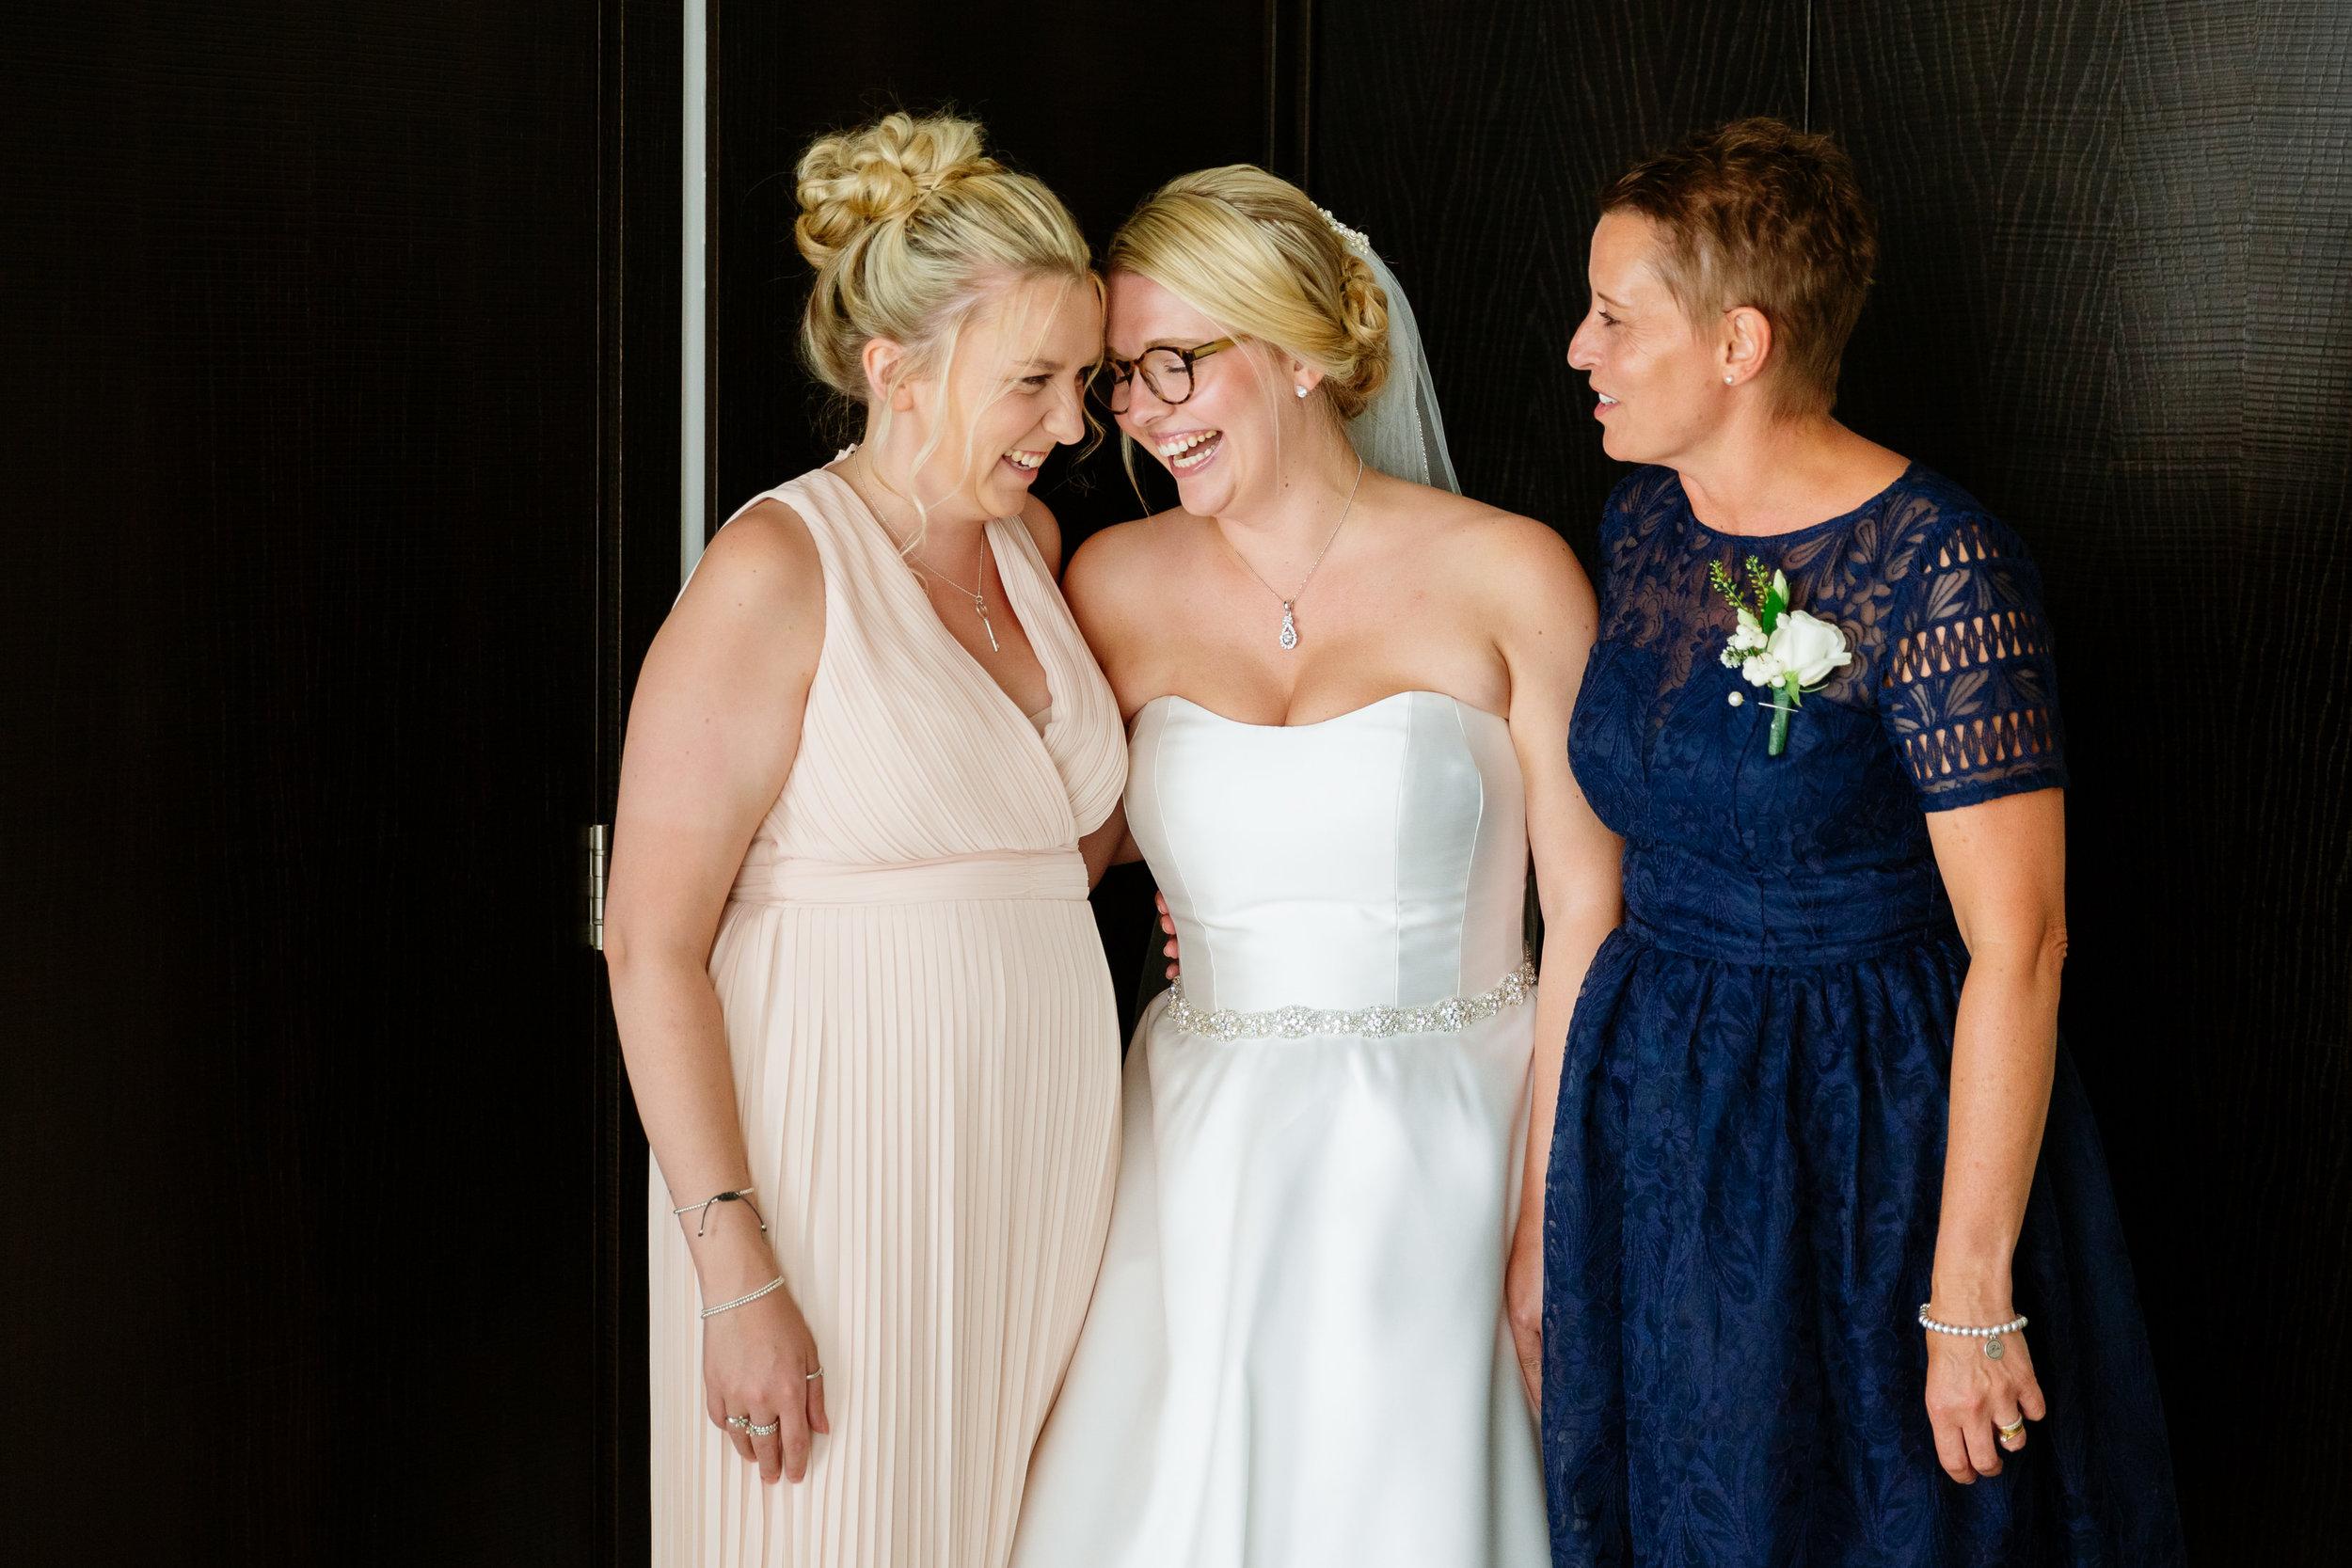 Malta_wedding_photography-31.jpg